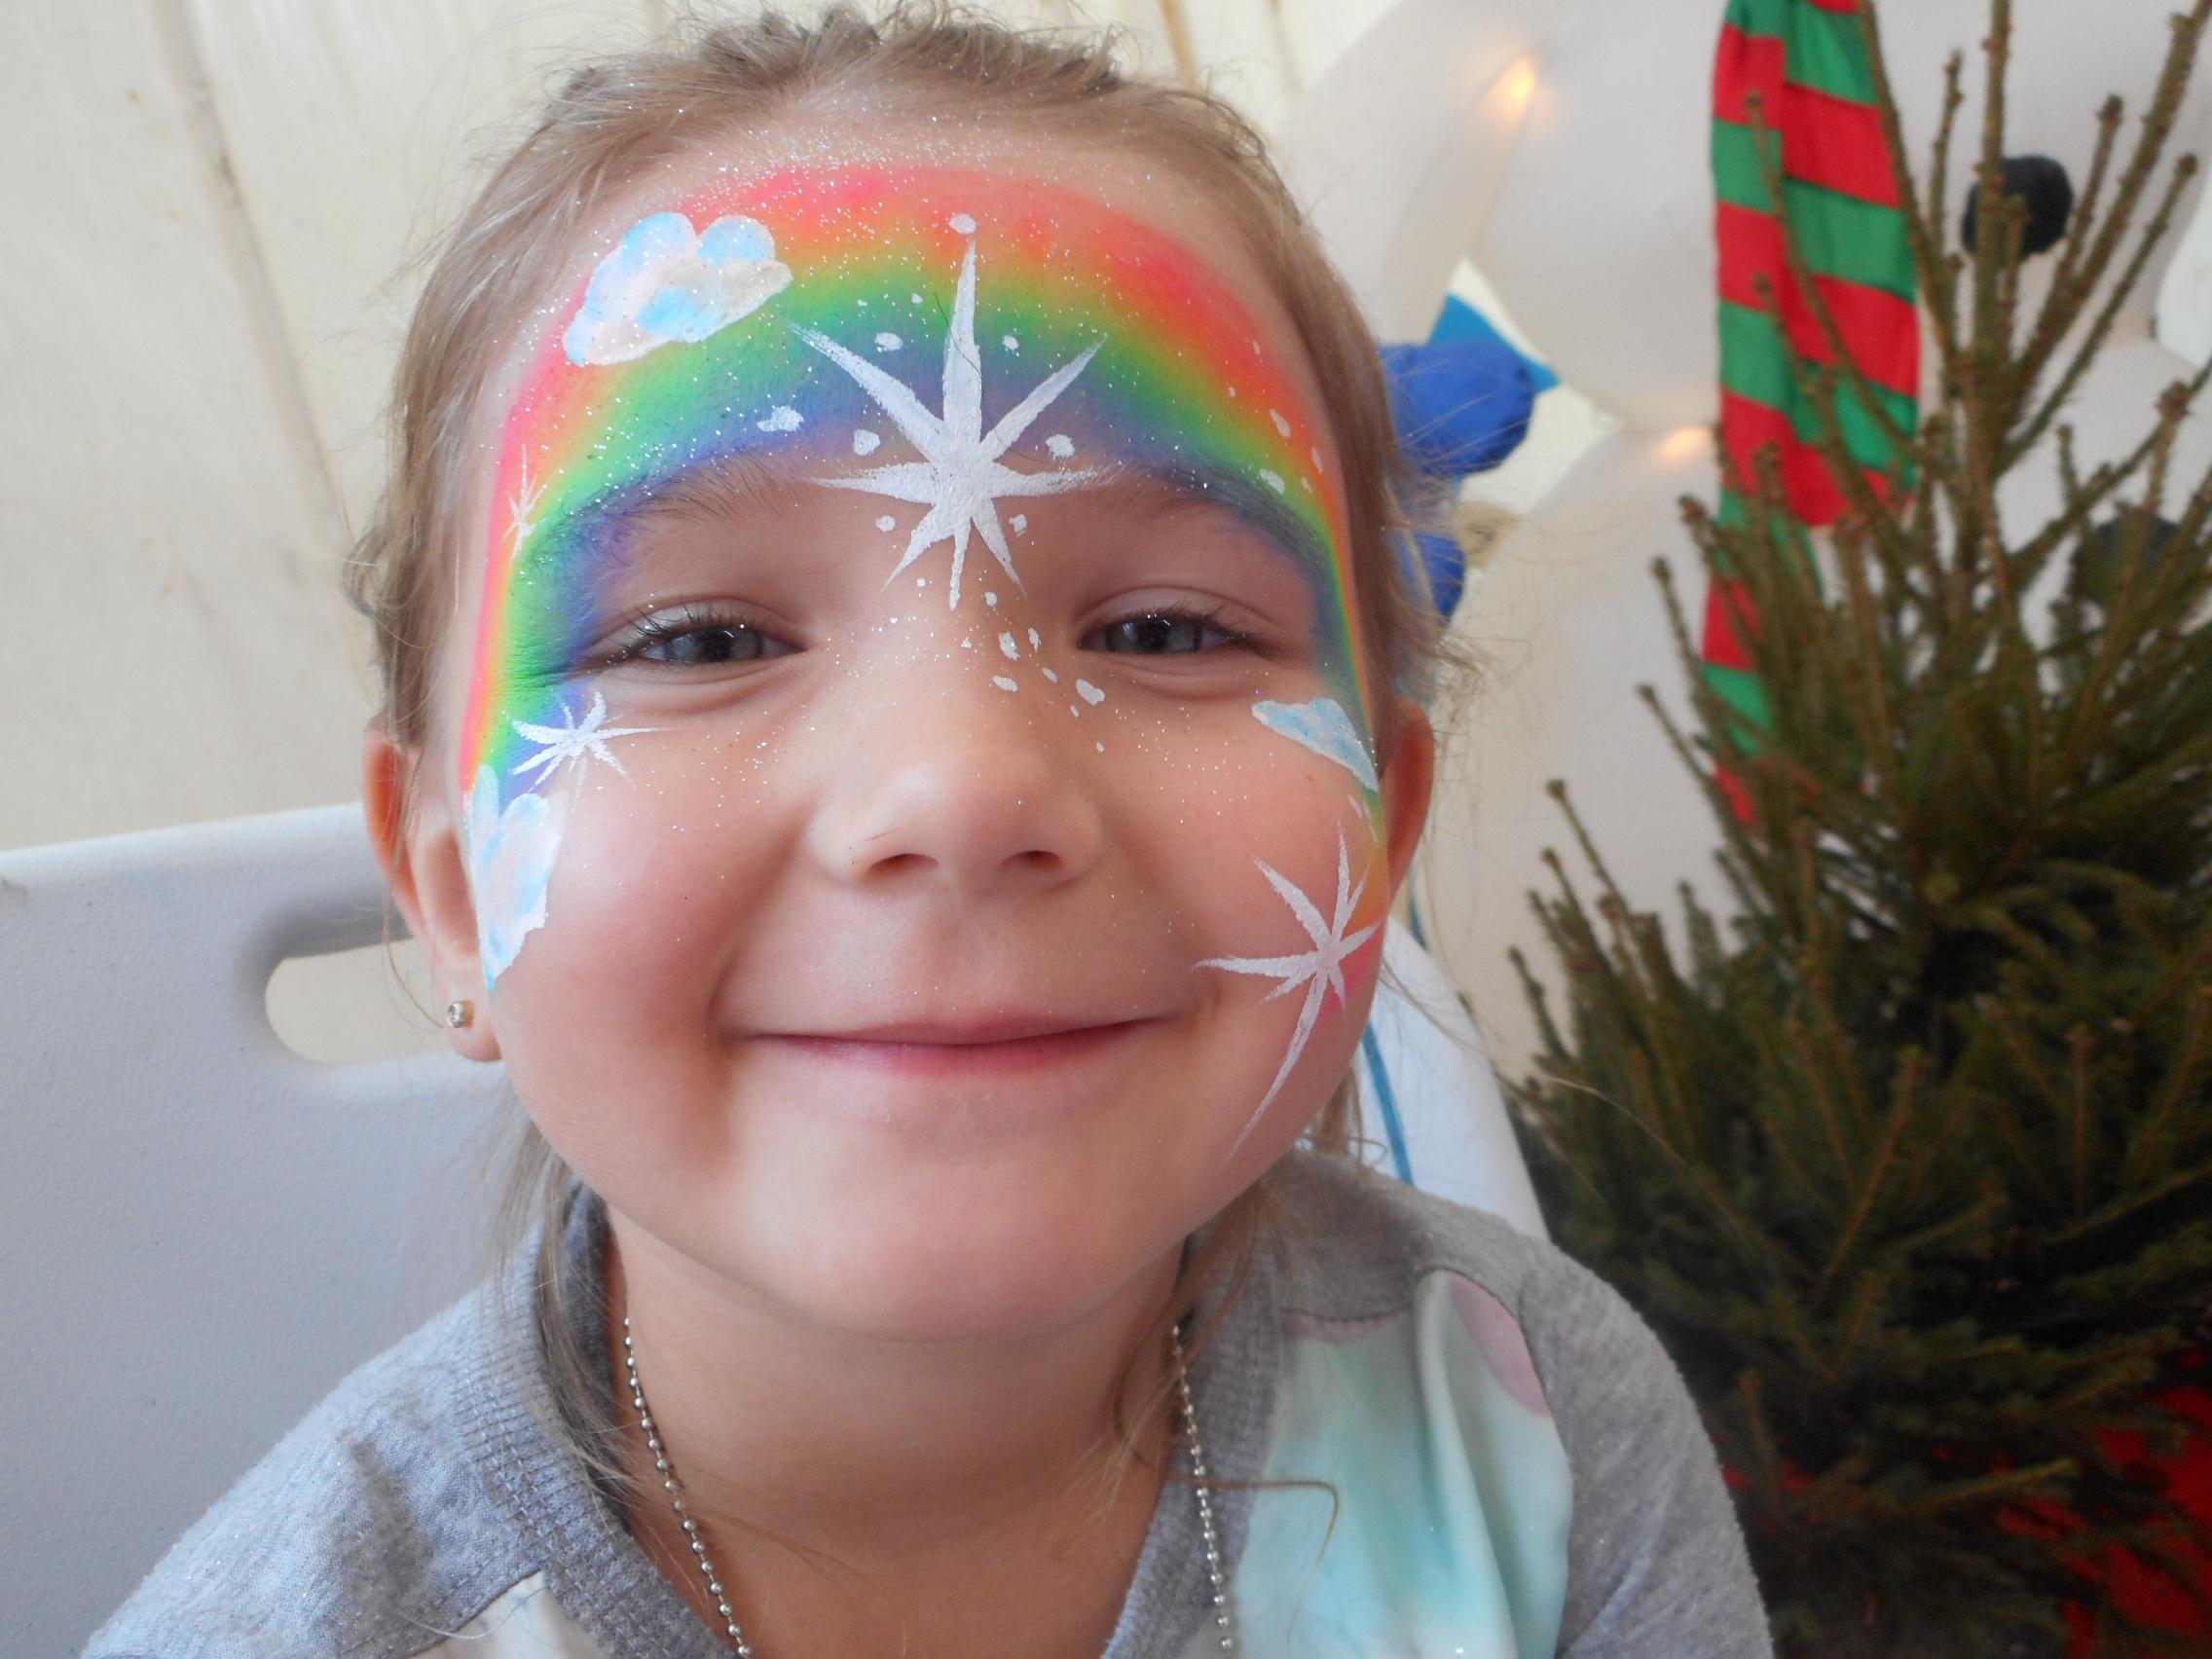 Maquillage enfant - Noël Bonifacio